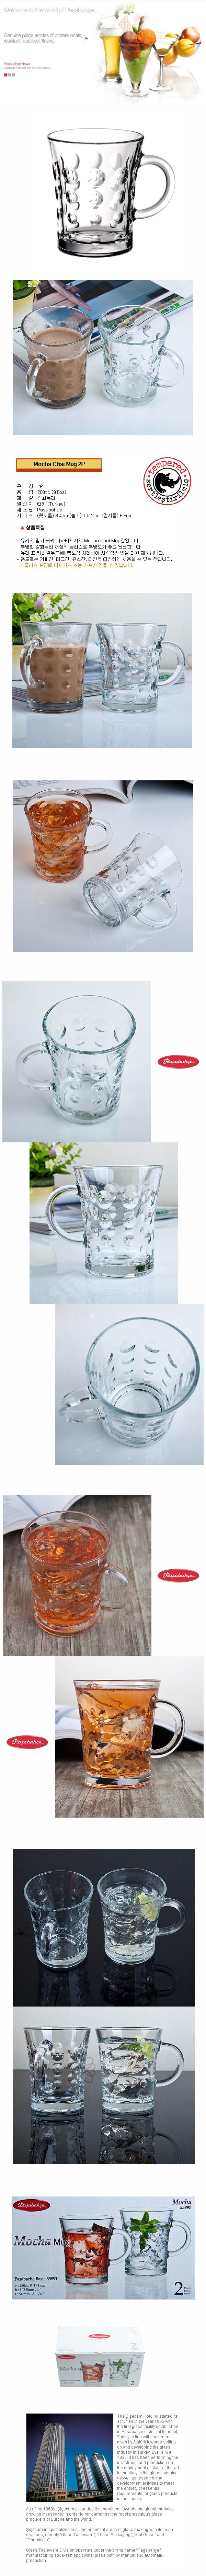 Mocha Chai Mug(머그잔) 2P - 더리빙샵, 10,500원, 머그컵, 머그컵 세트